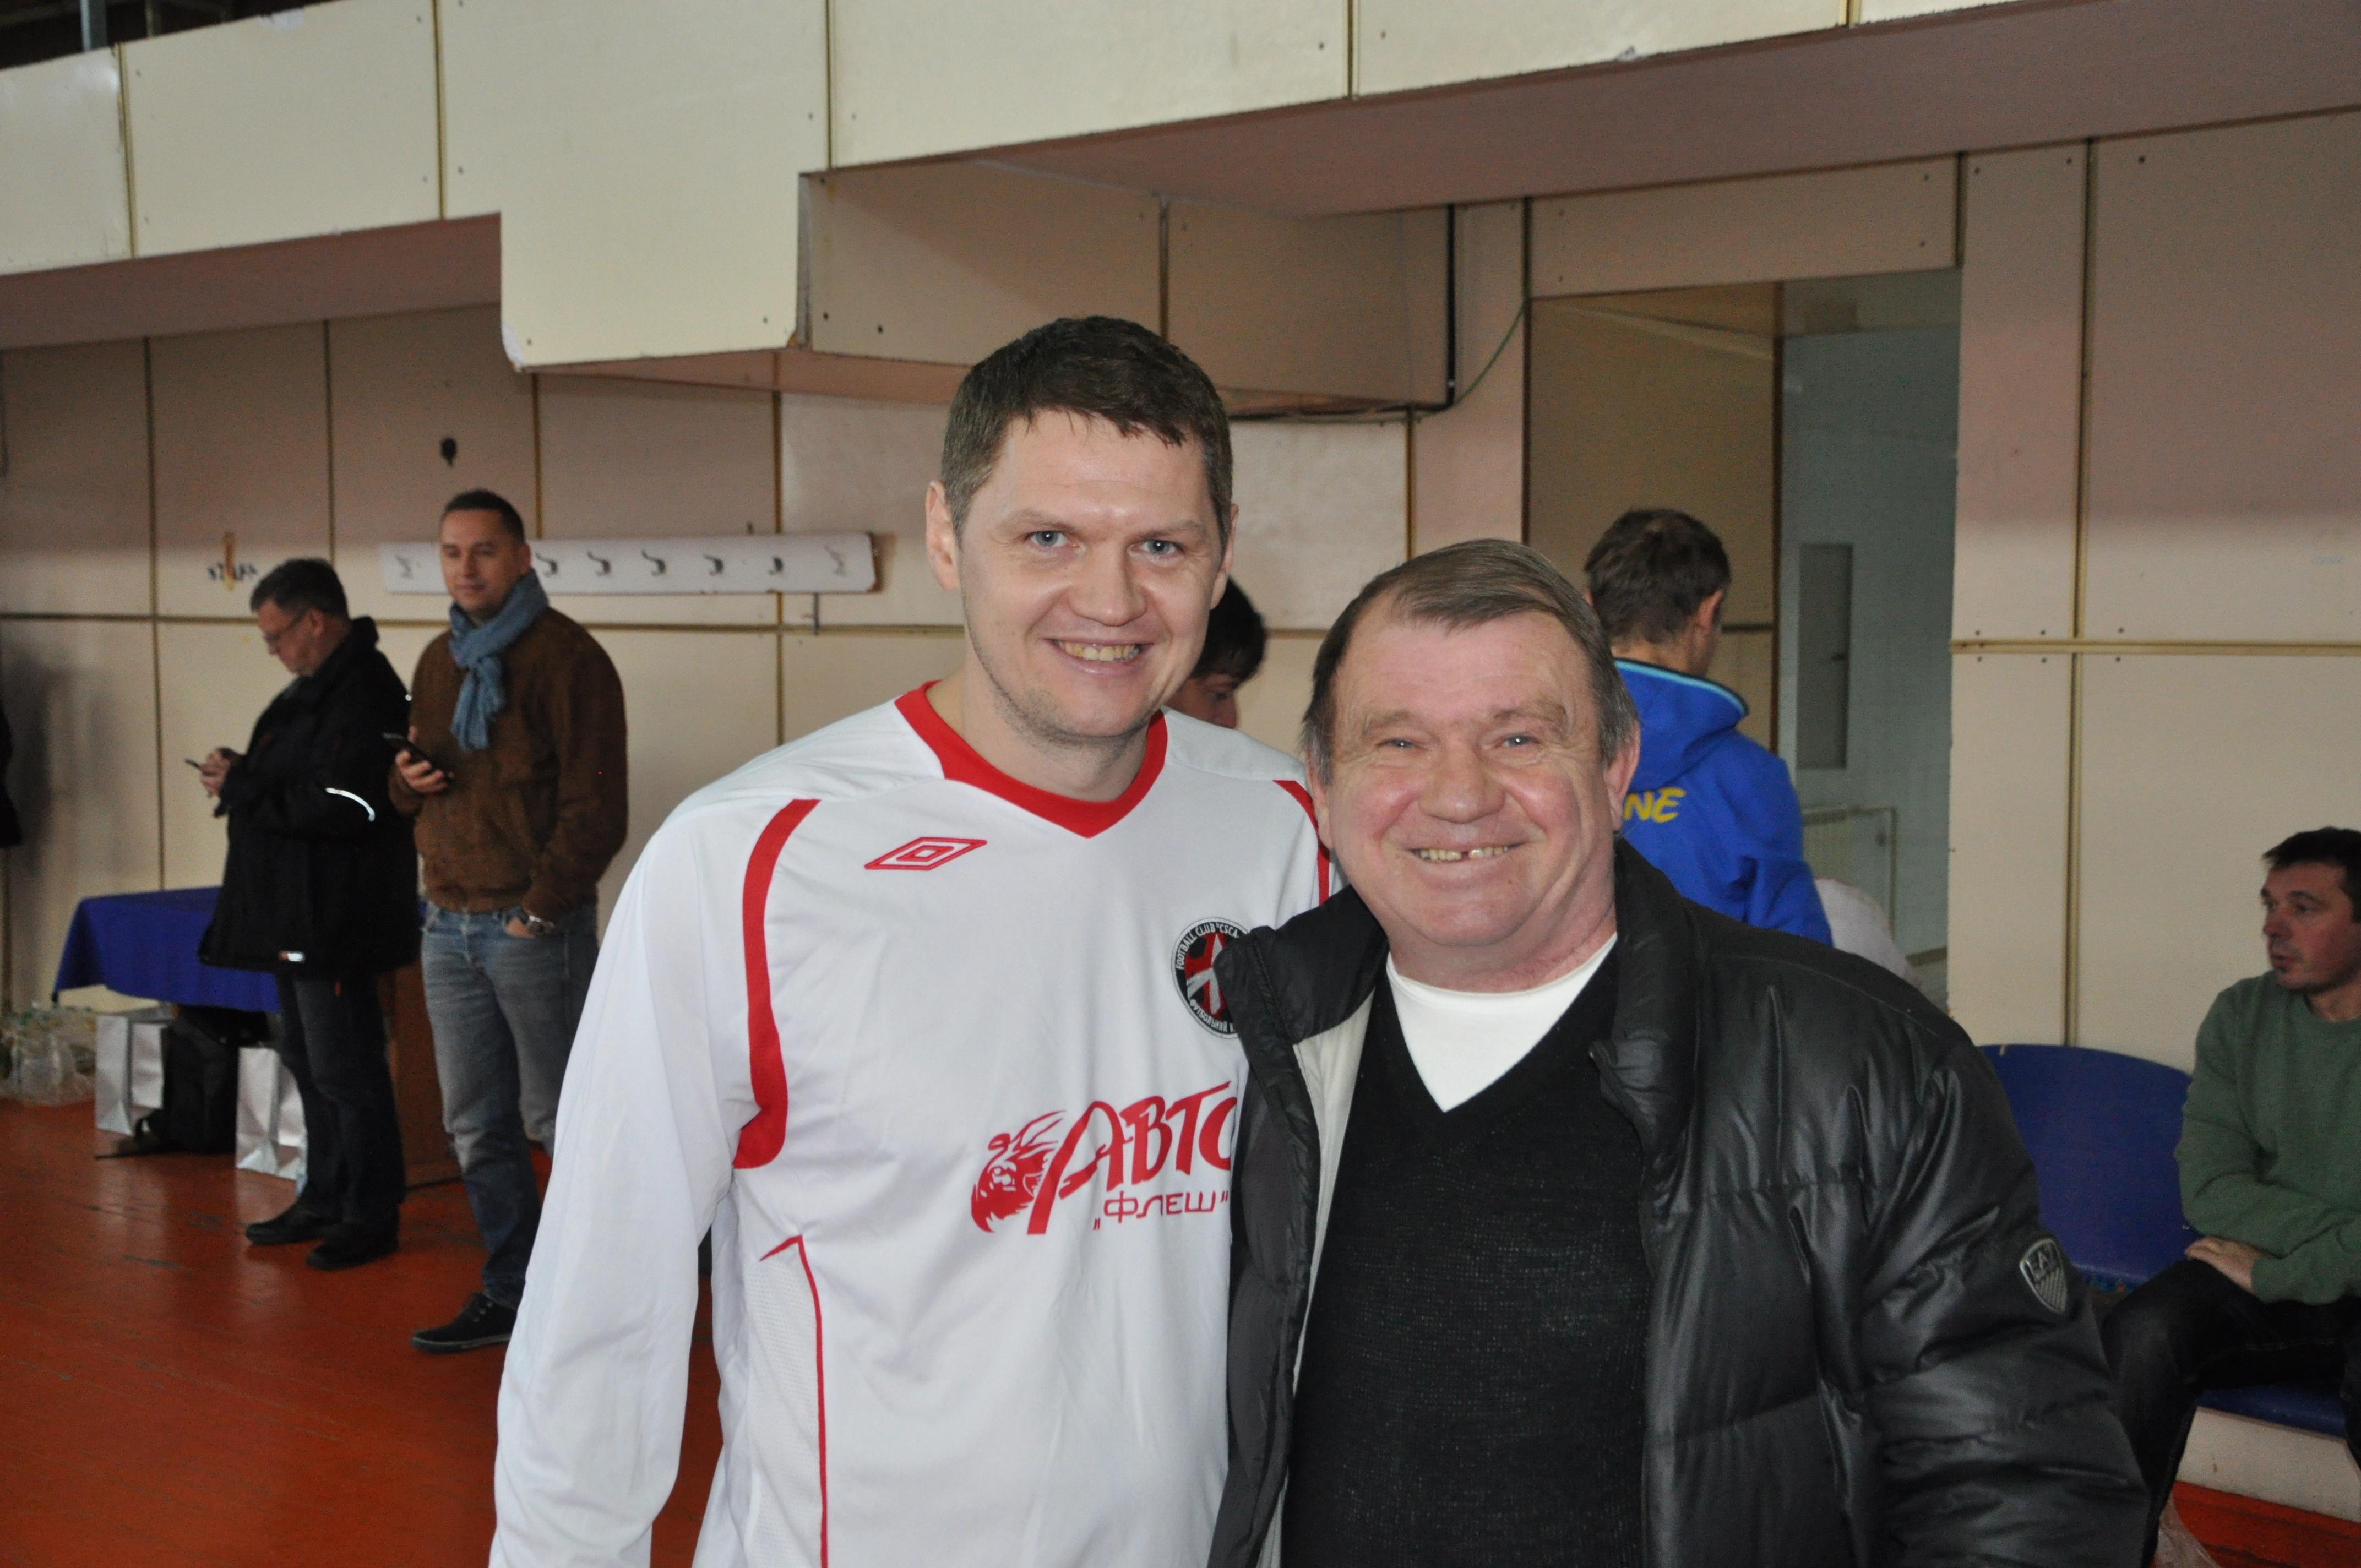 Состоялся турнир памяти Виктора Колотова и Евгения Рудакова (+Фото) - изображение 3